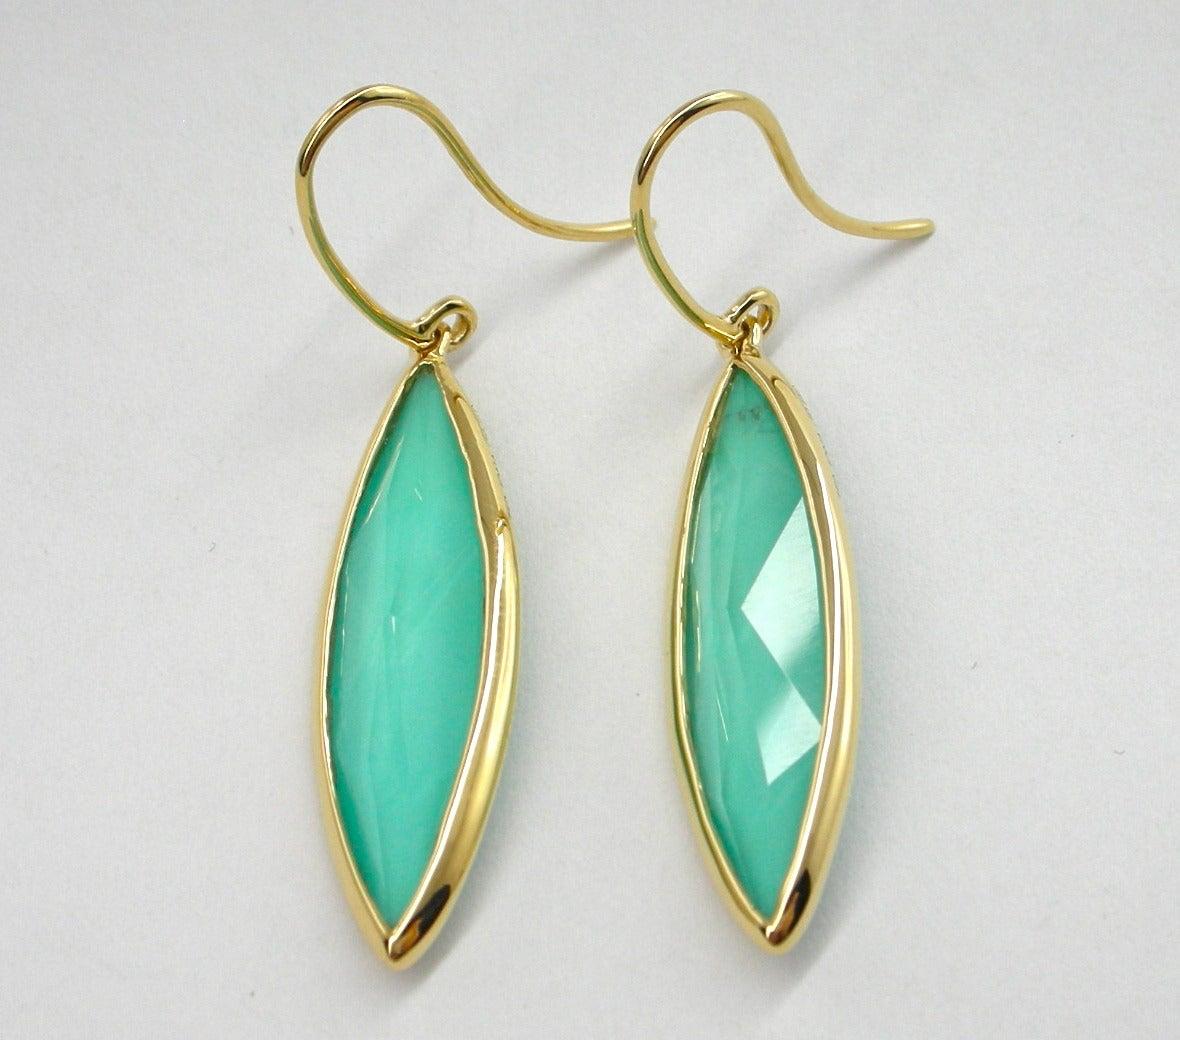 Jona Turquoise Quartz 18 Karat Yellow Gold Dangle Earrings In New Condition For Sale In Torino, IT